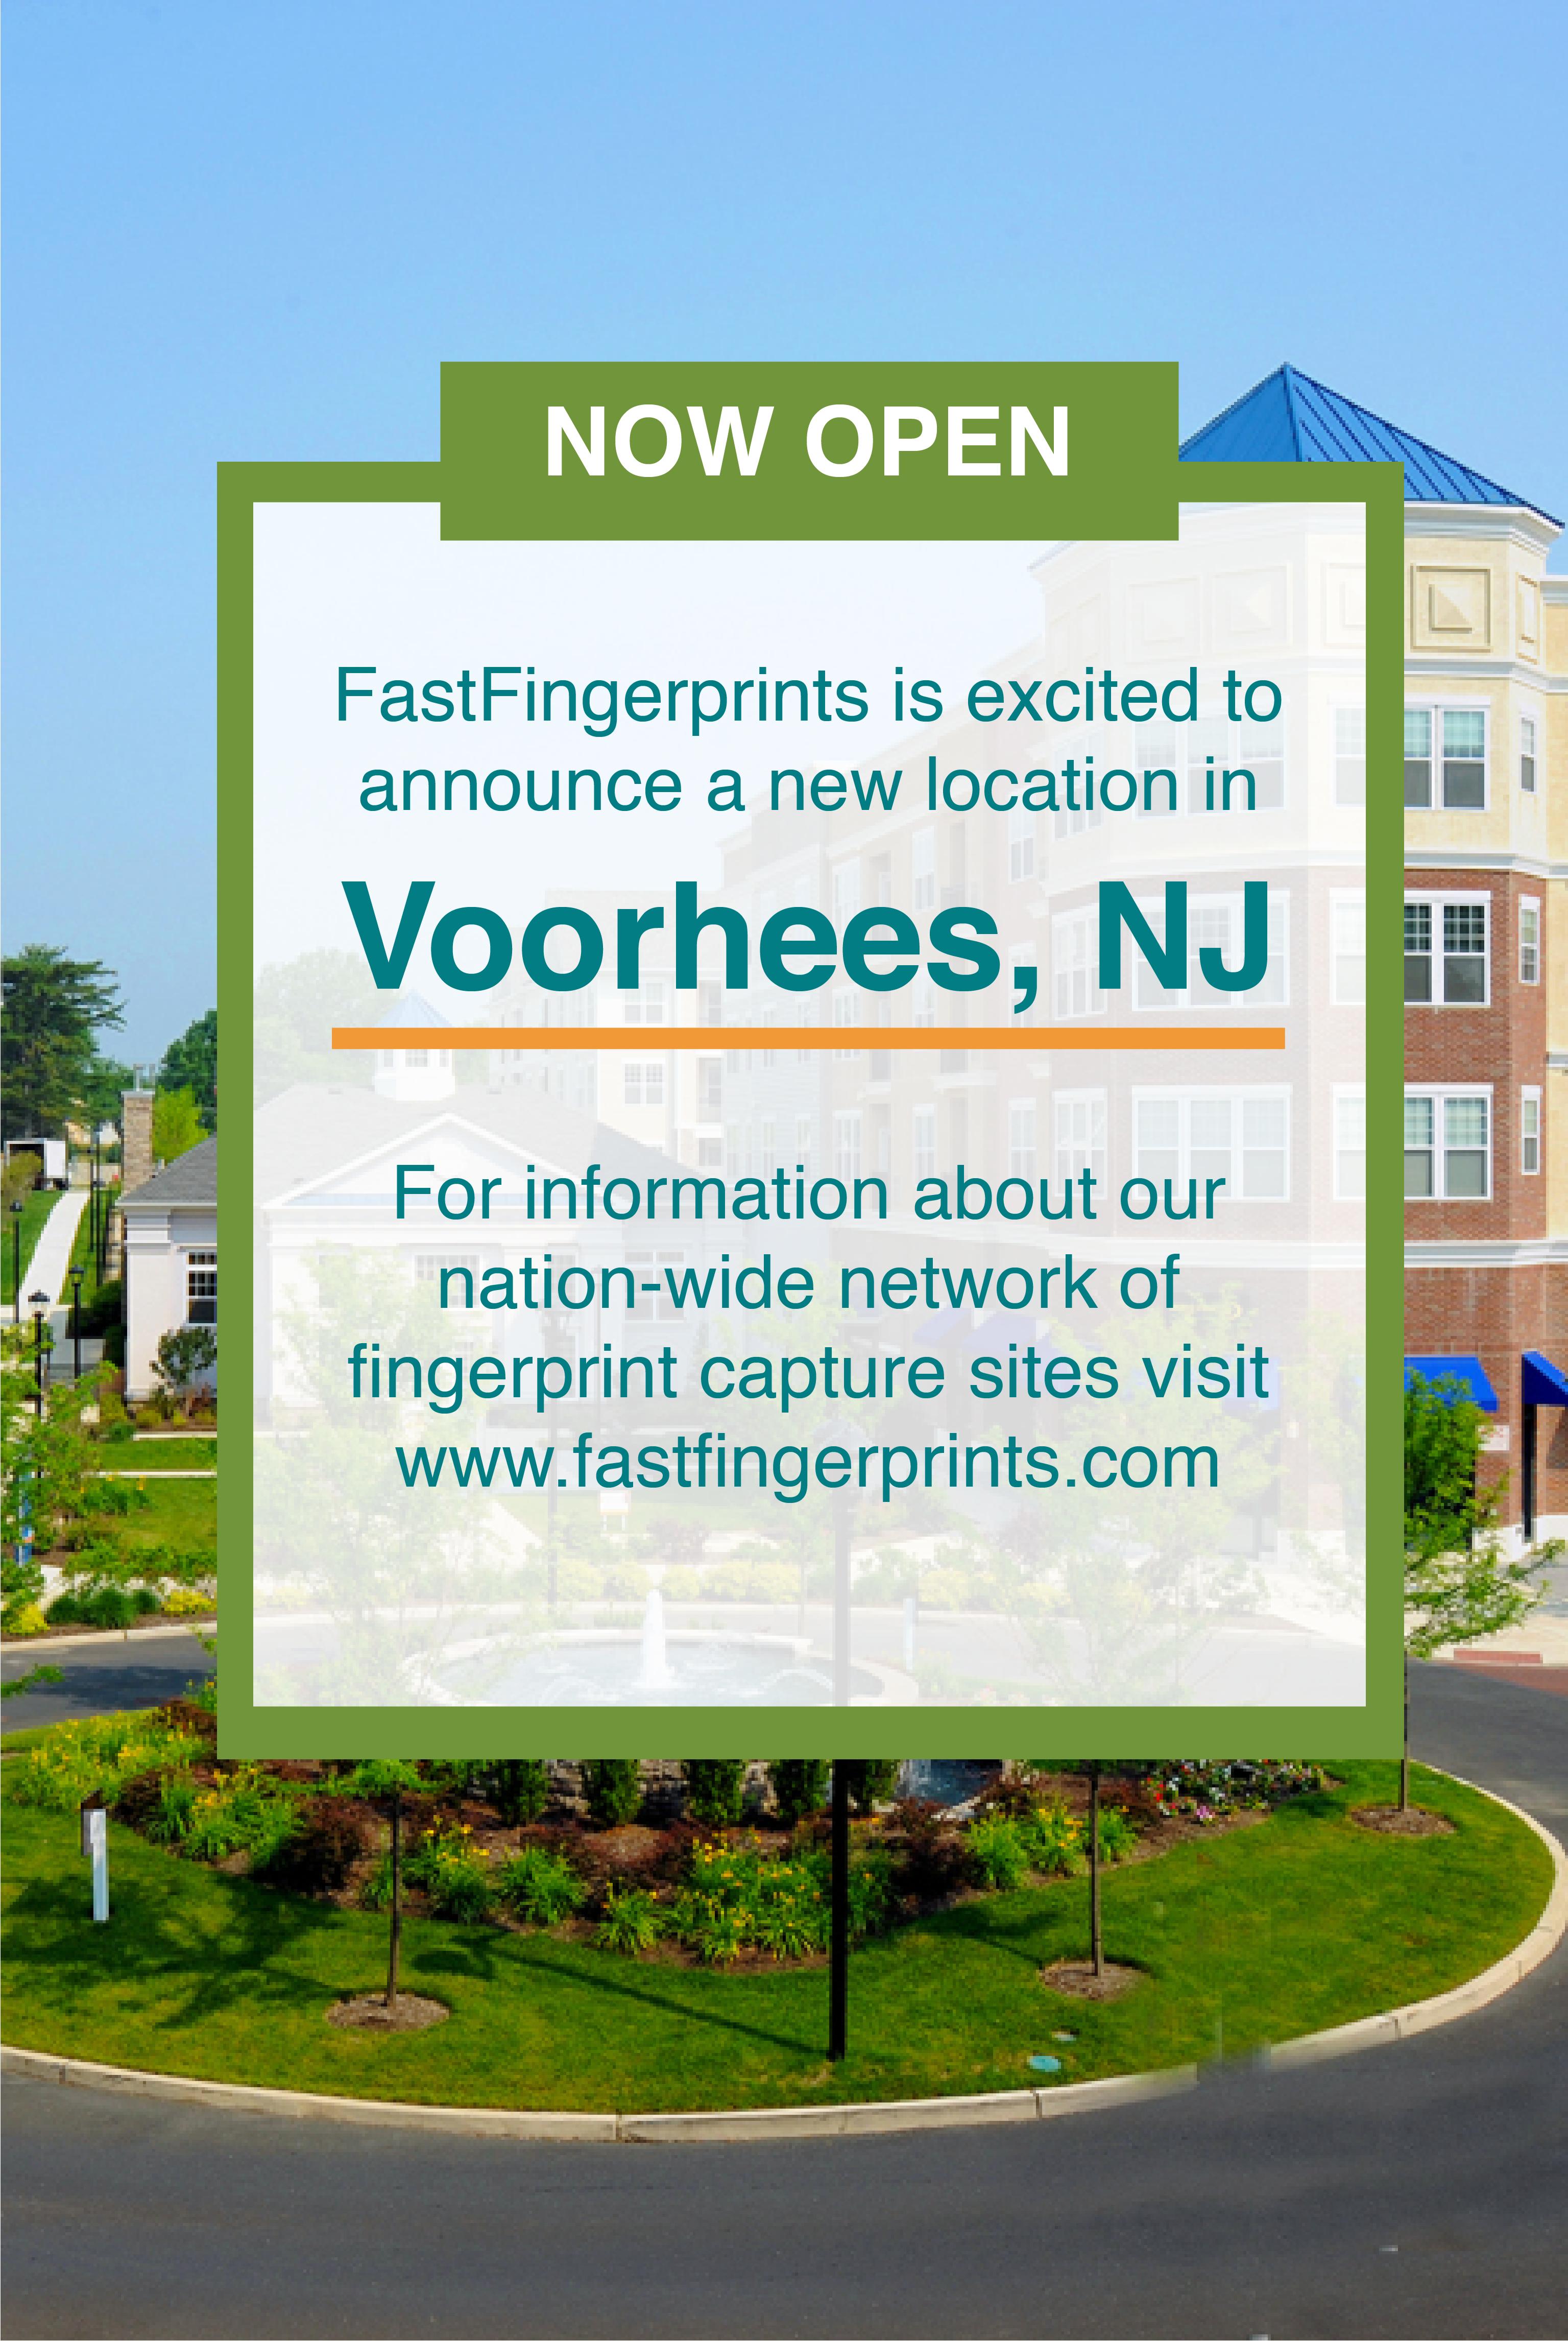 Fastfingerprints Voorhees Now Open Background Check Informative Fingerprint Cards